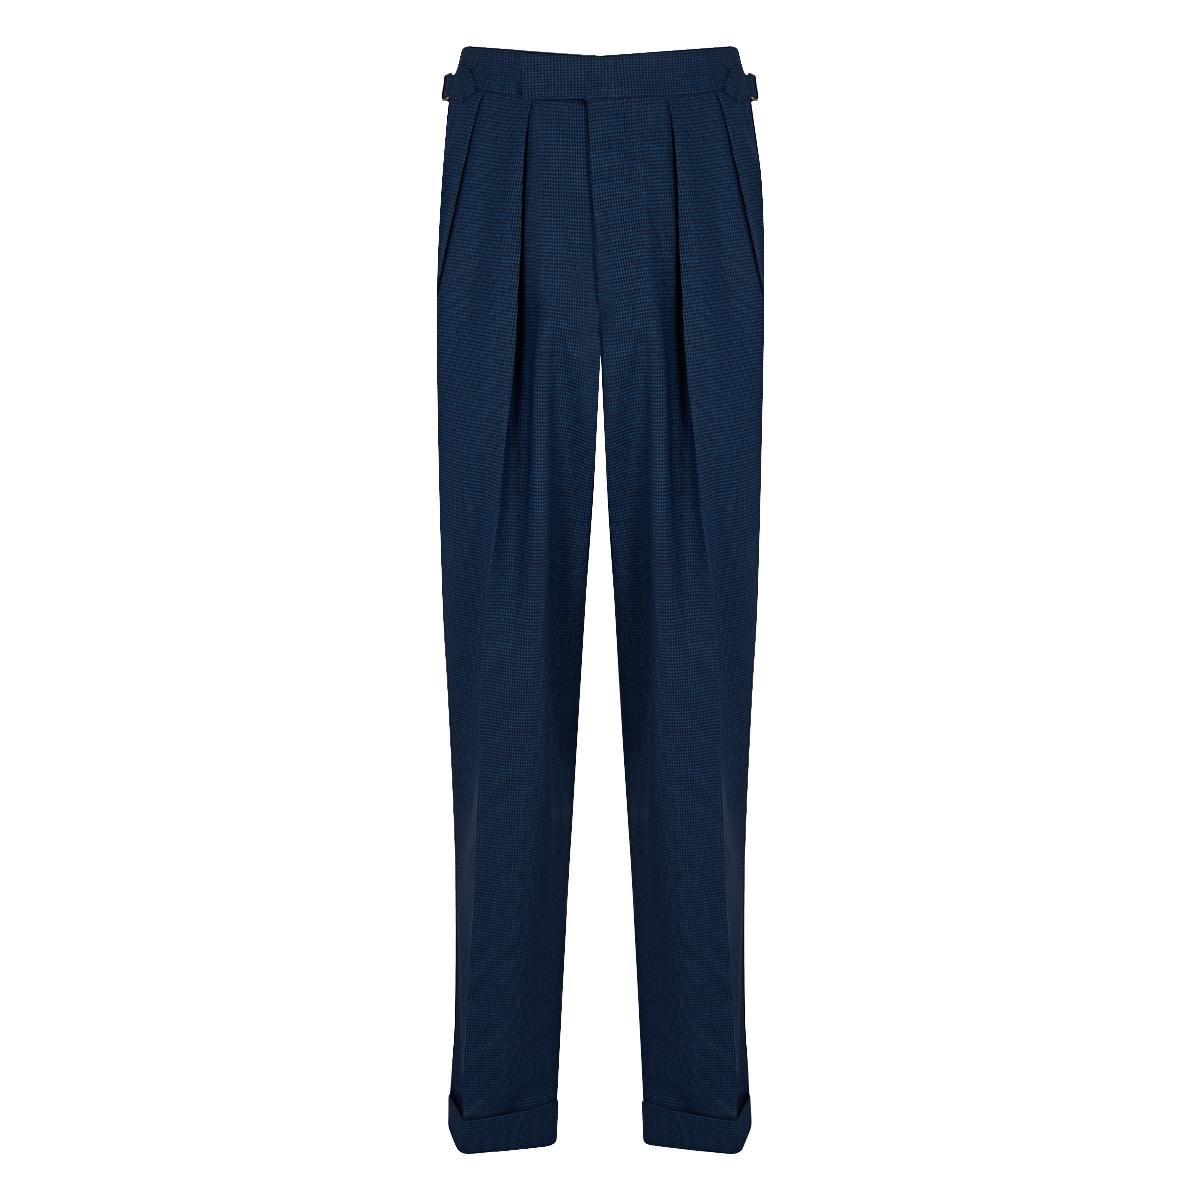 Blue Houndstooth 4-Ply Tropical Wool Aleksandar Trousers